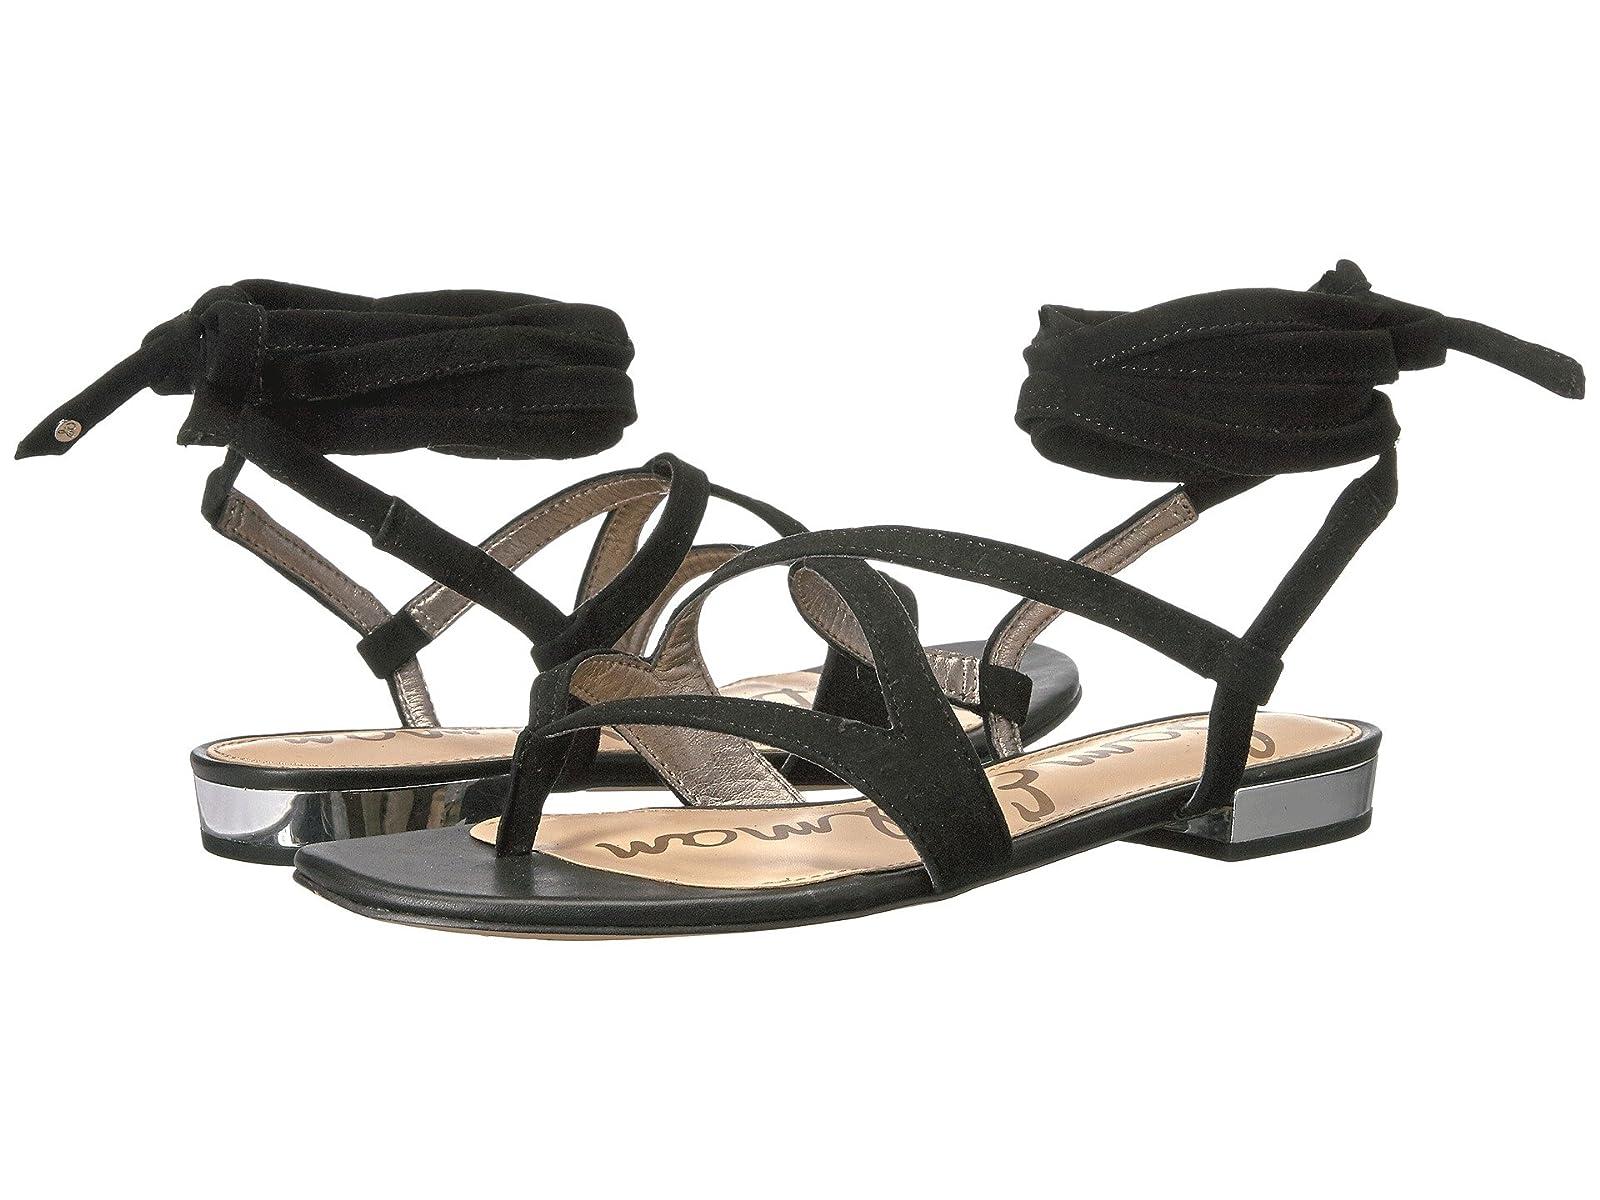 Sam Edelman DavinaCheap and distinctive eye-catching shoes